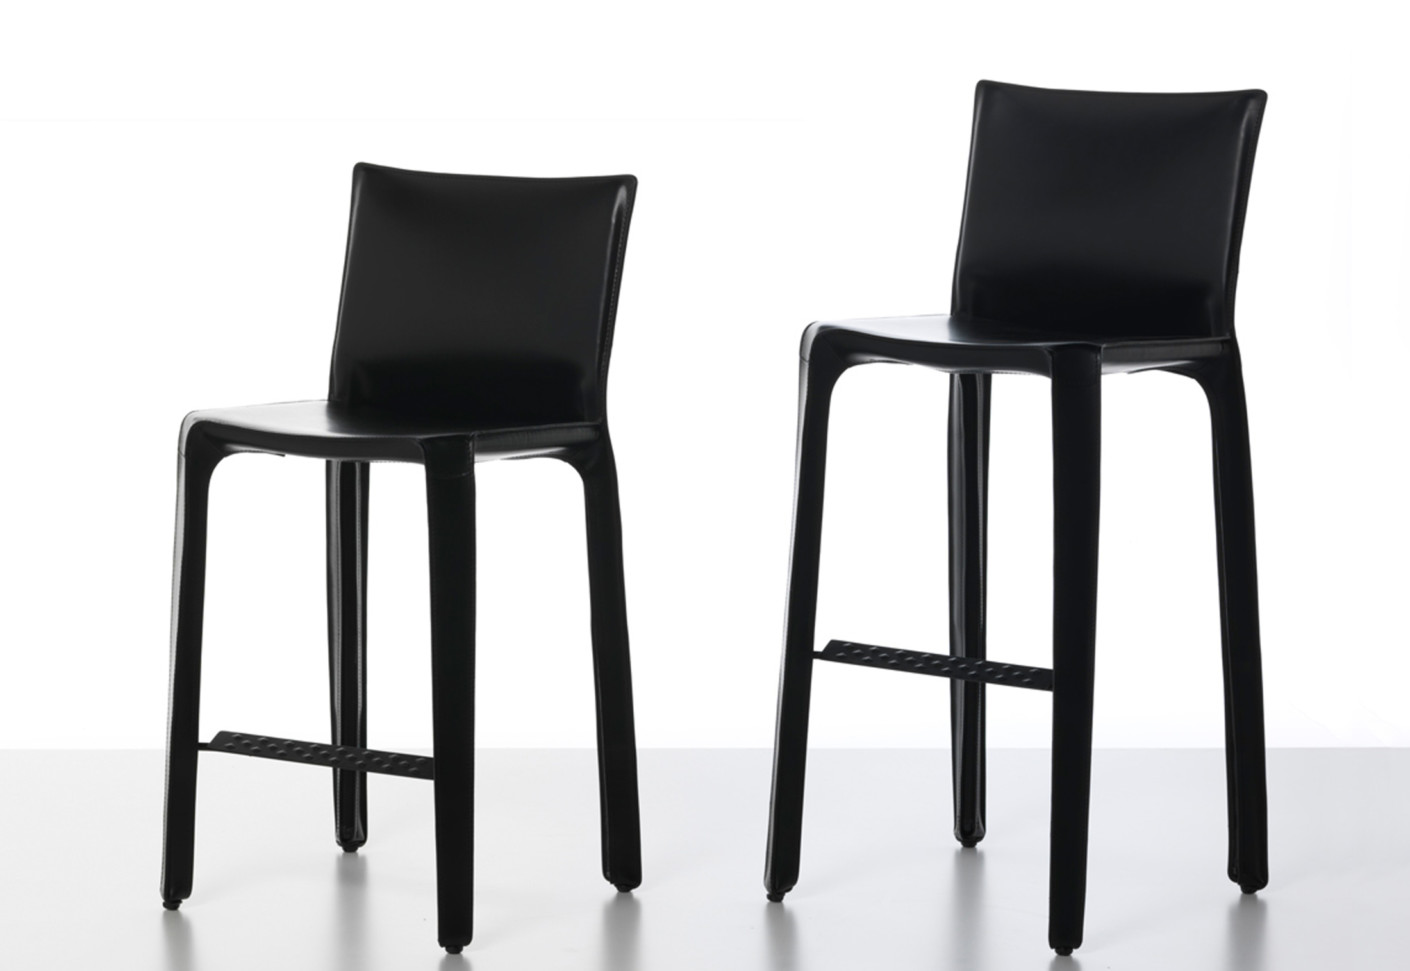 Cab bar stool by Cassina STYLEPARK : cab bar stool 2 from www.stylepark.com size 1410 x 971 jpeg 84kB